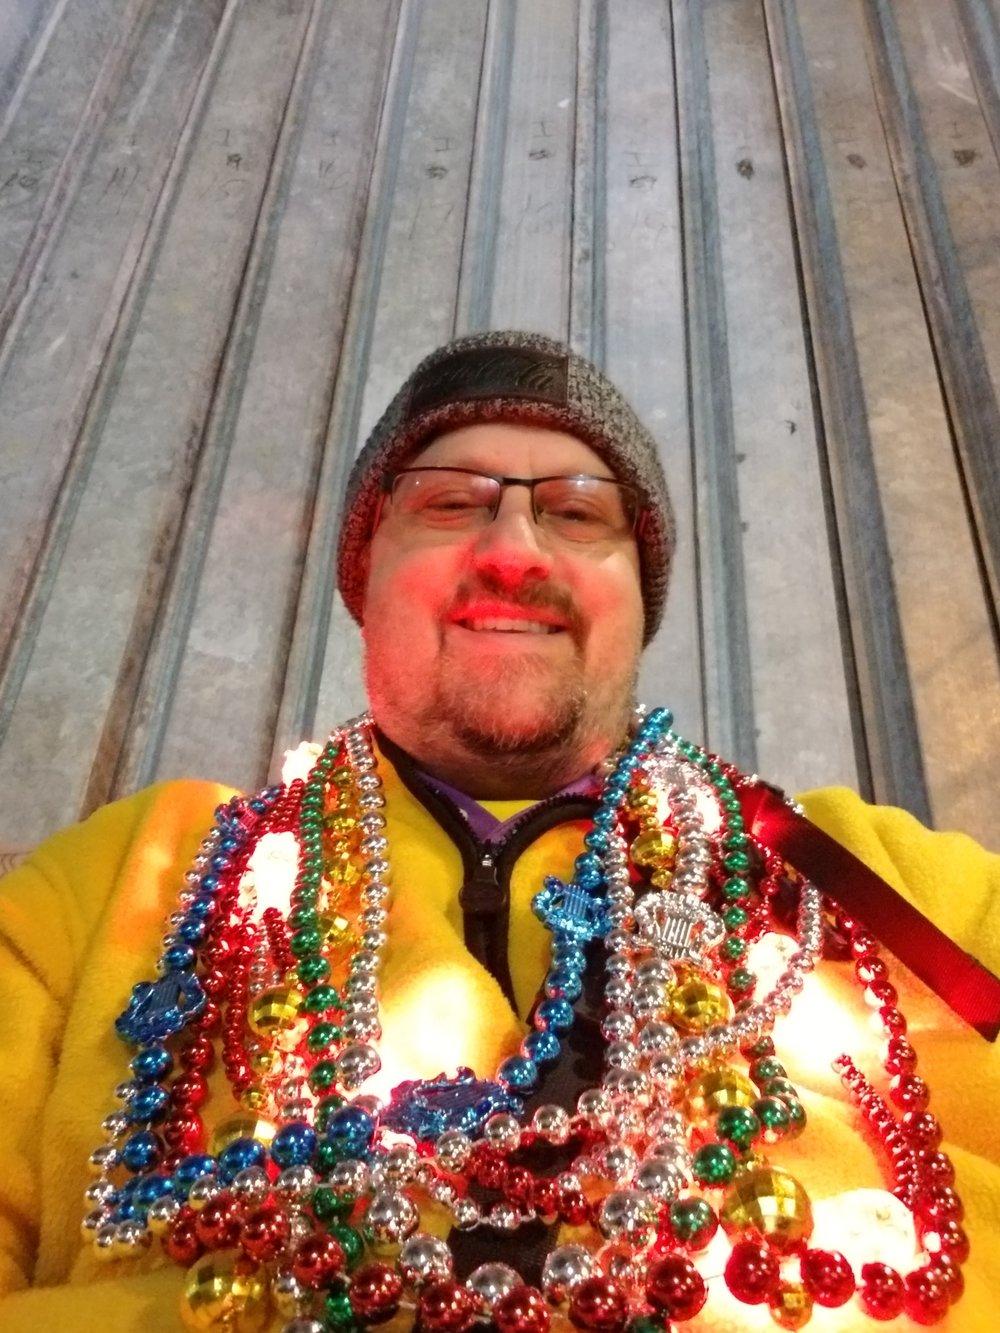 Beads New Orleans Mardi Gras